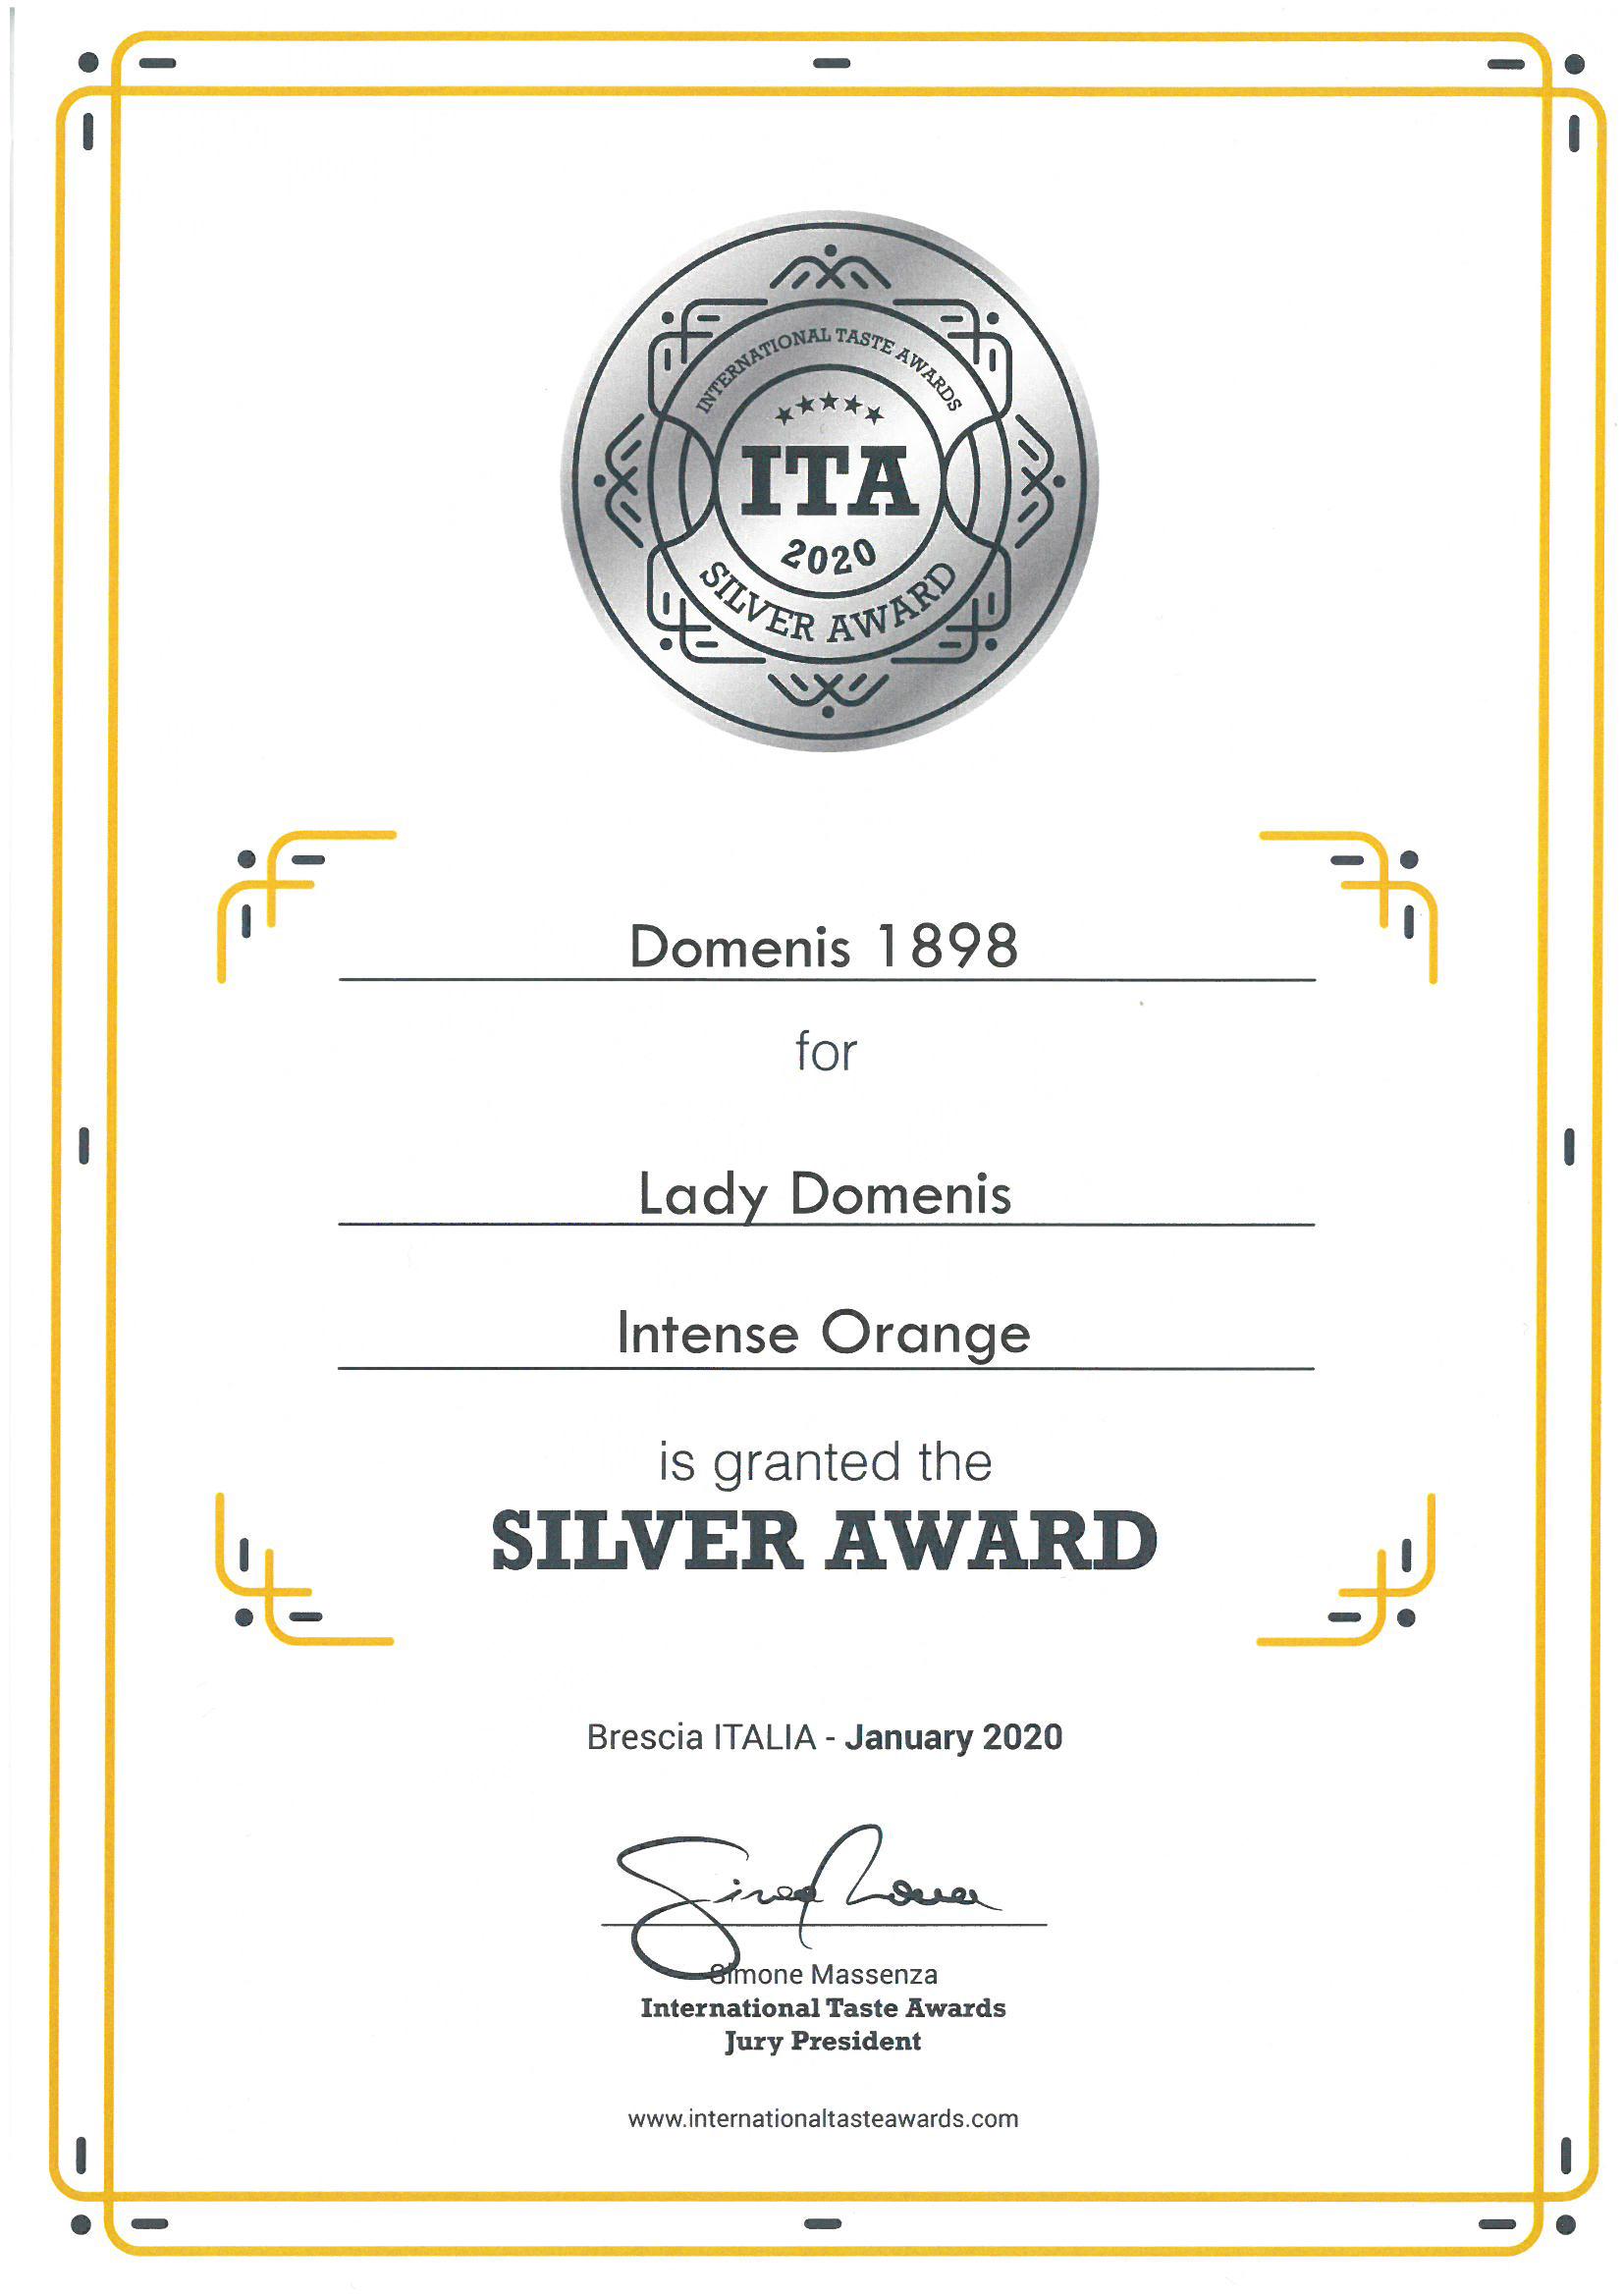 International Taste Awards 2020 – LADY Domenis Intense Orange